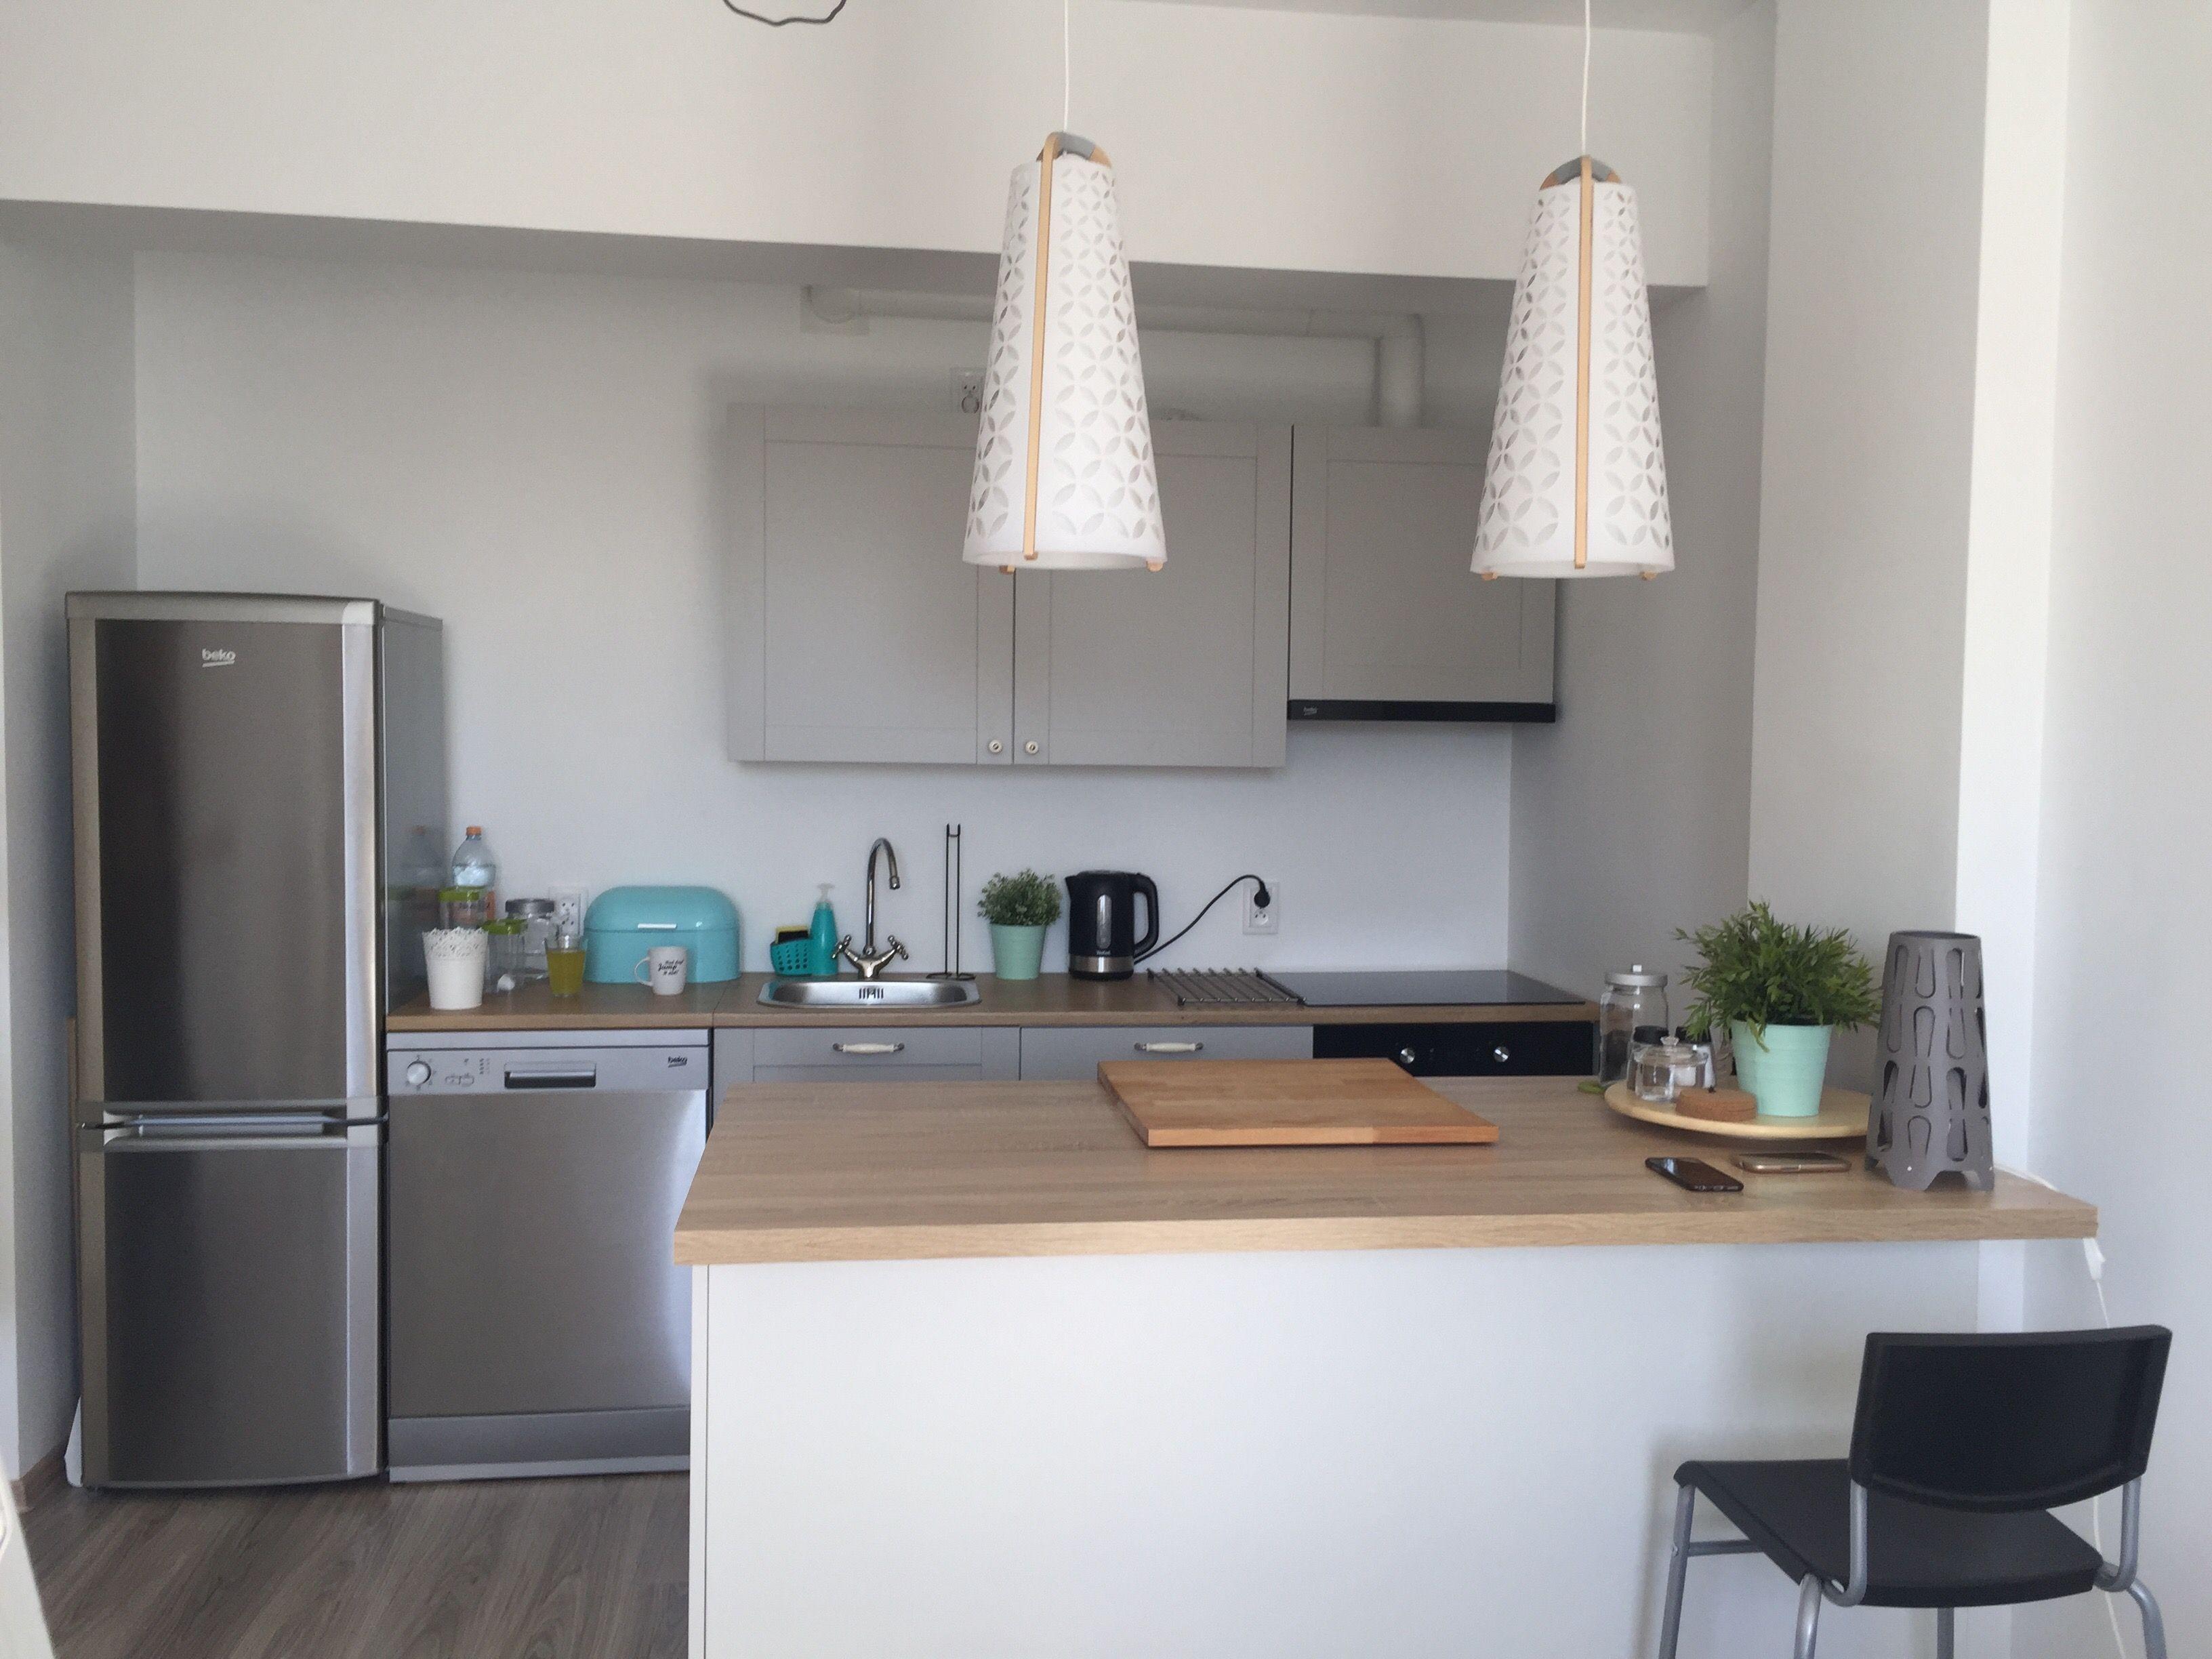 Knoxhult IKEA grey kitchen   Кухня ikea, Серые кухни